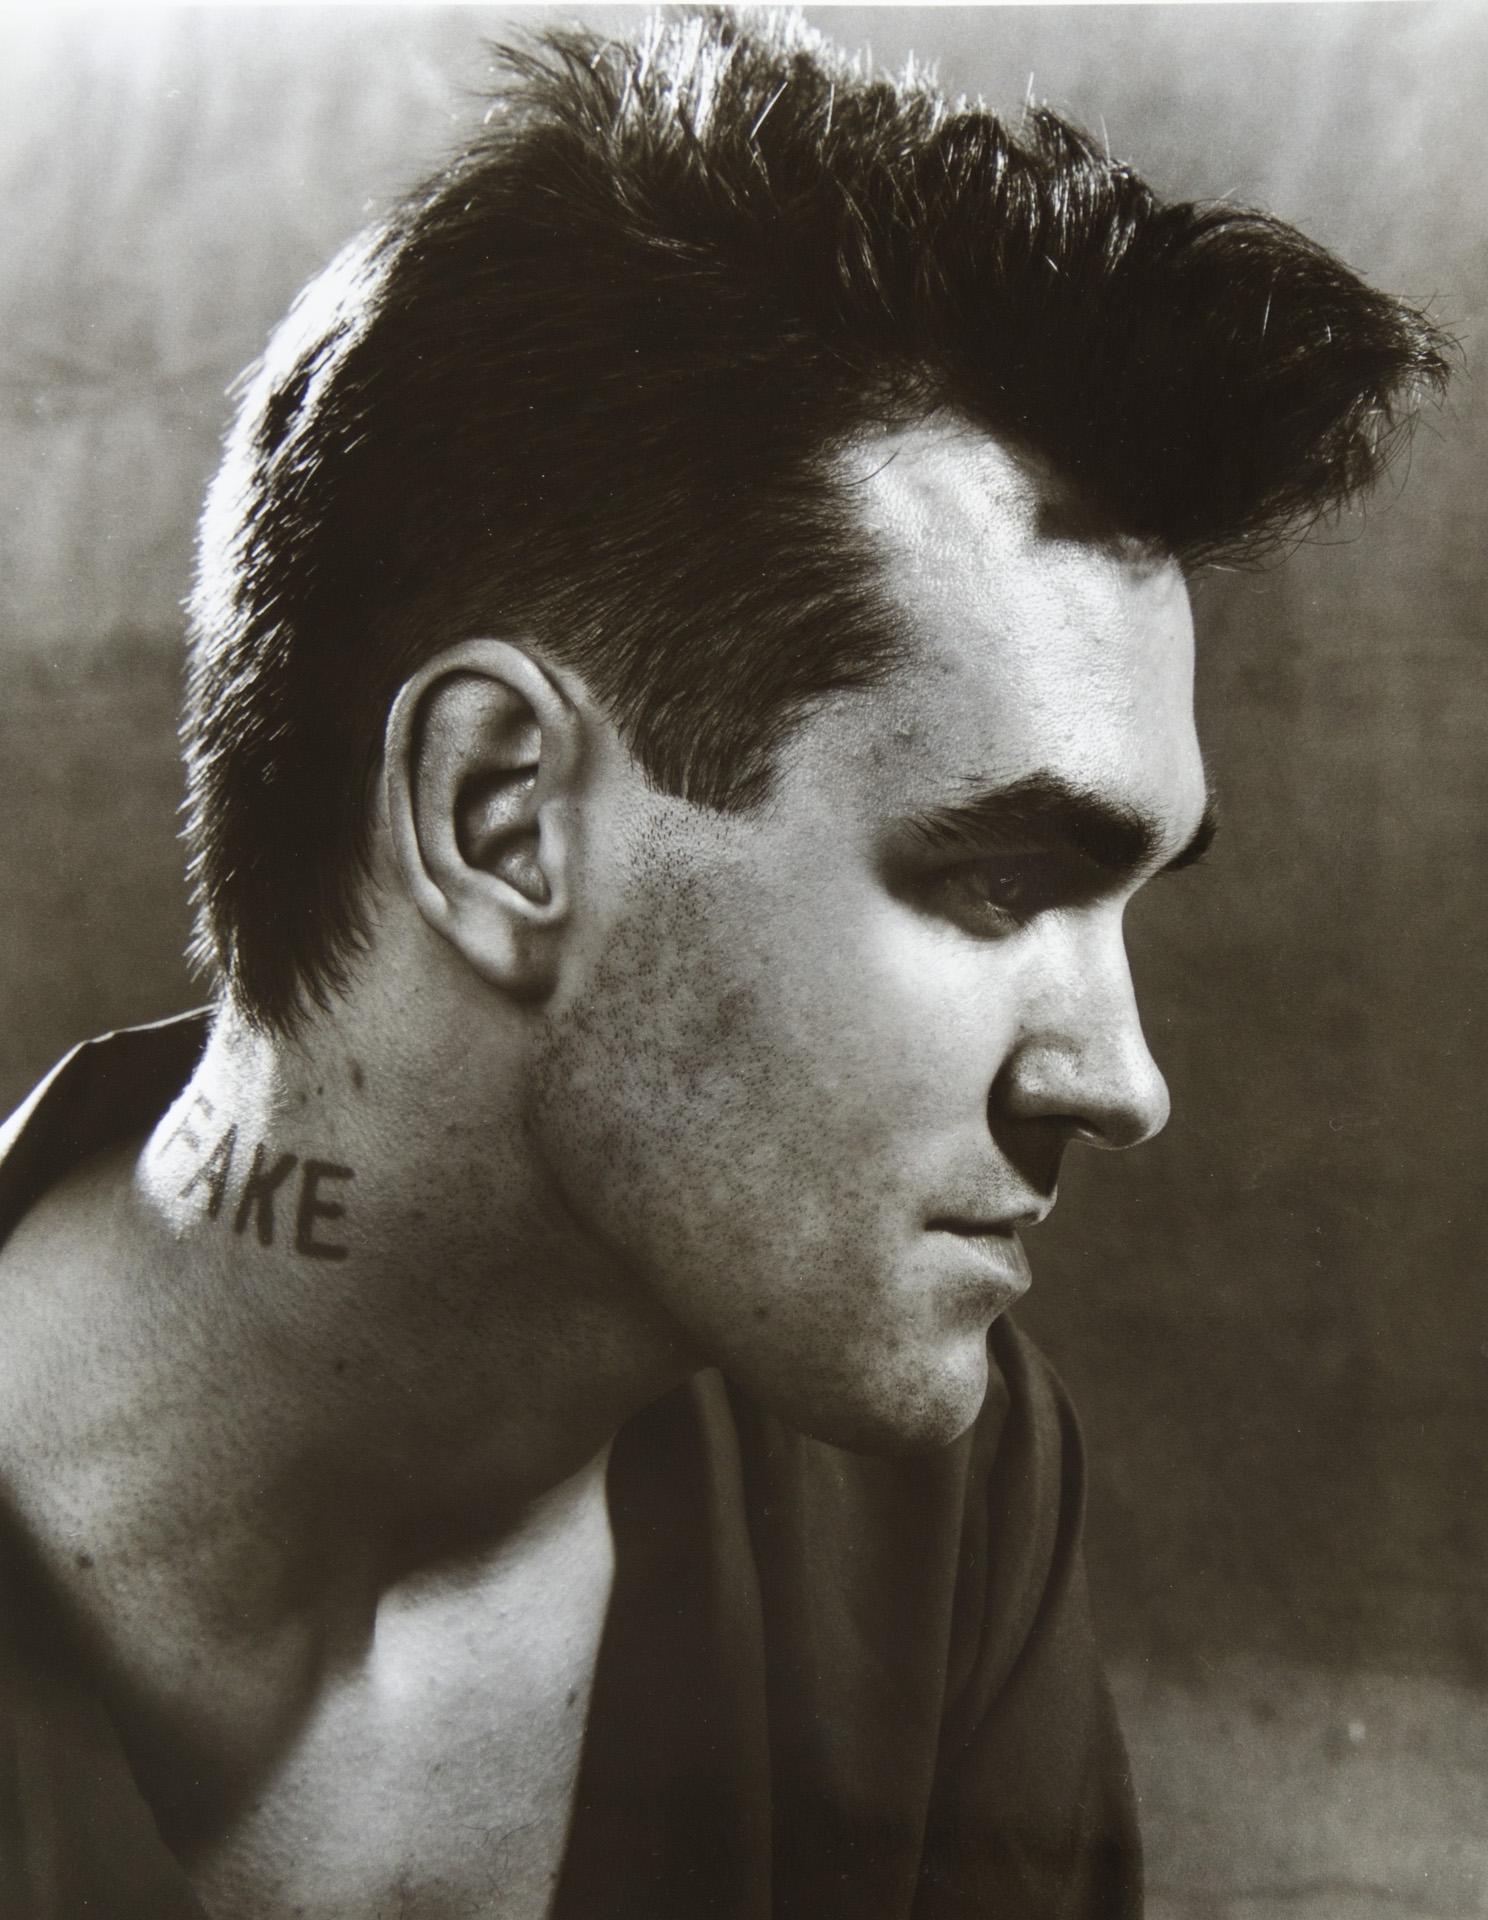 MorrisseyBirrerBigFake.jpg